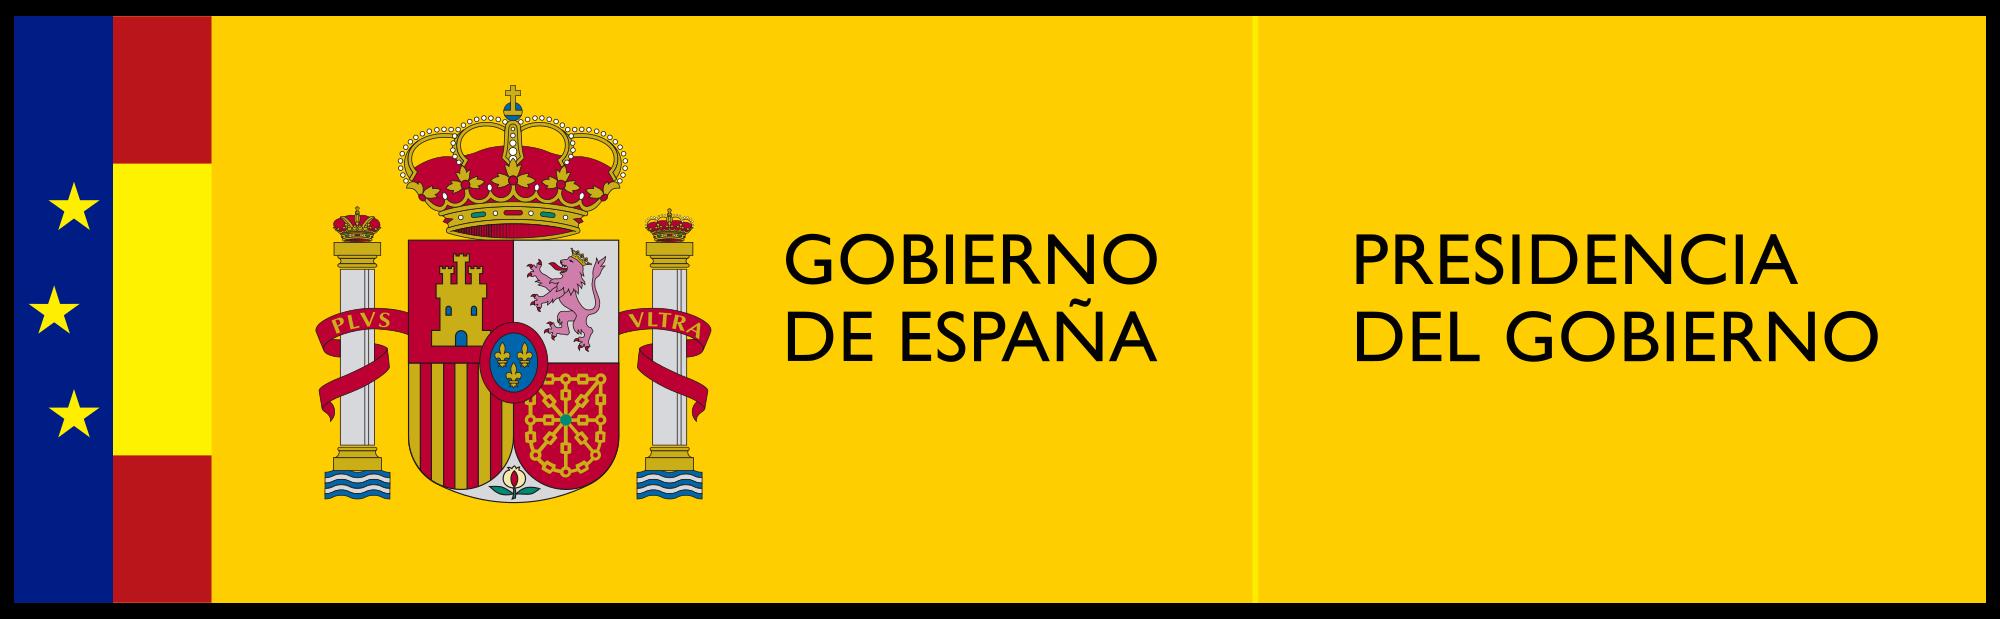 [X Legislatura] Registro del Senado Logo_de_la_Presidencia_del_Gobierno